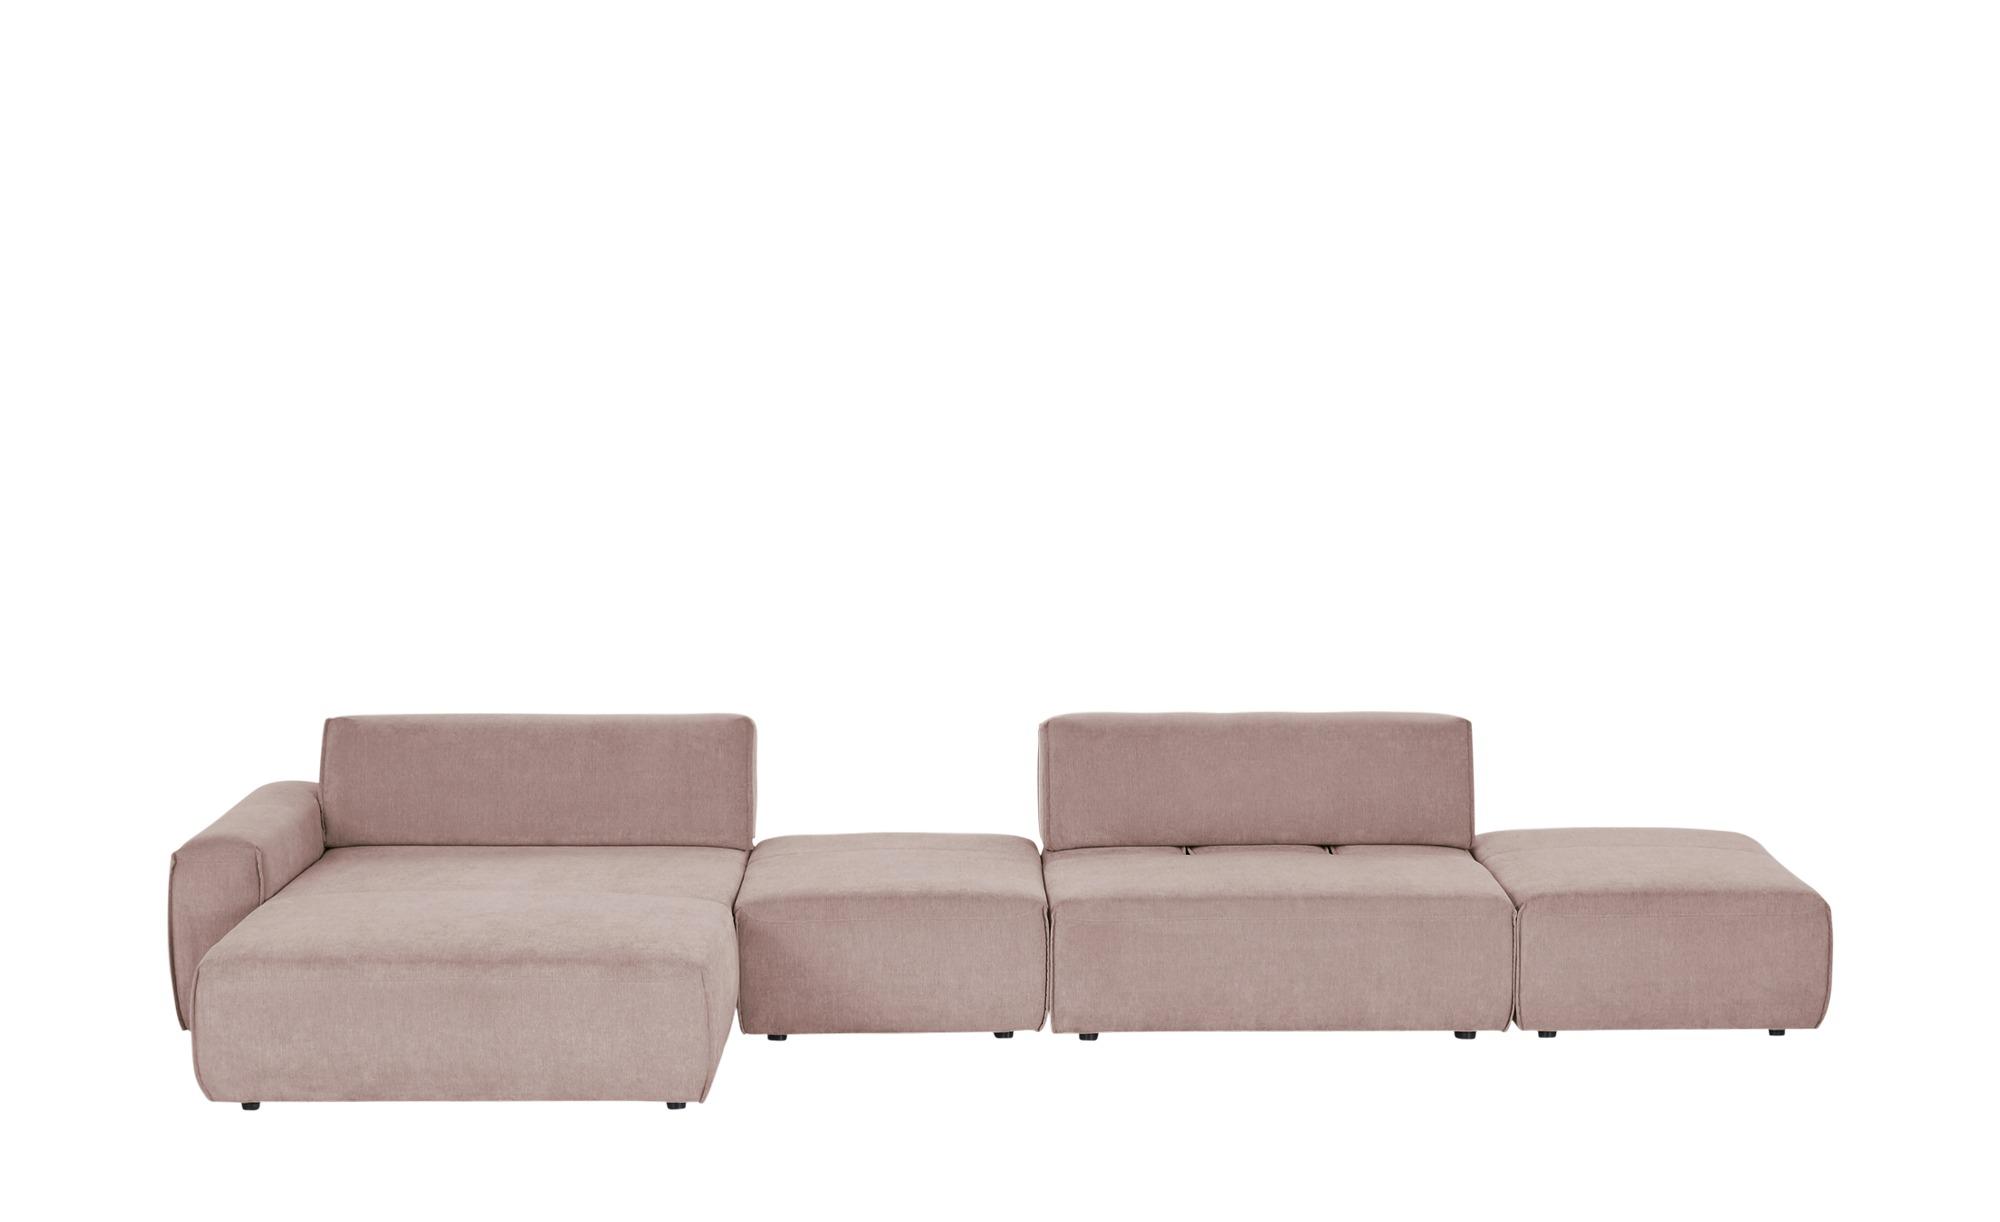 Max Schelling Ecksofa  Life ¦ rosa/pink ¦ Maße (cm): H: 74 Polstermöbel > Sofas > Ecksofas - Höffner